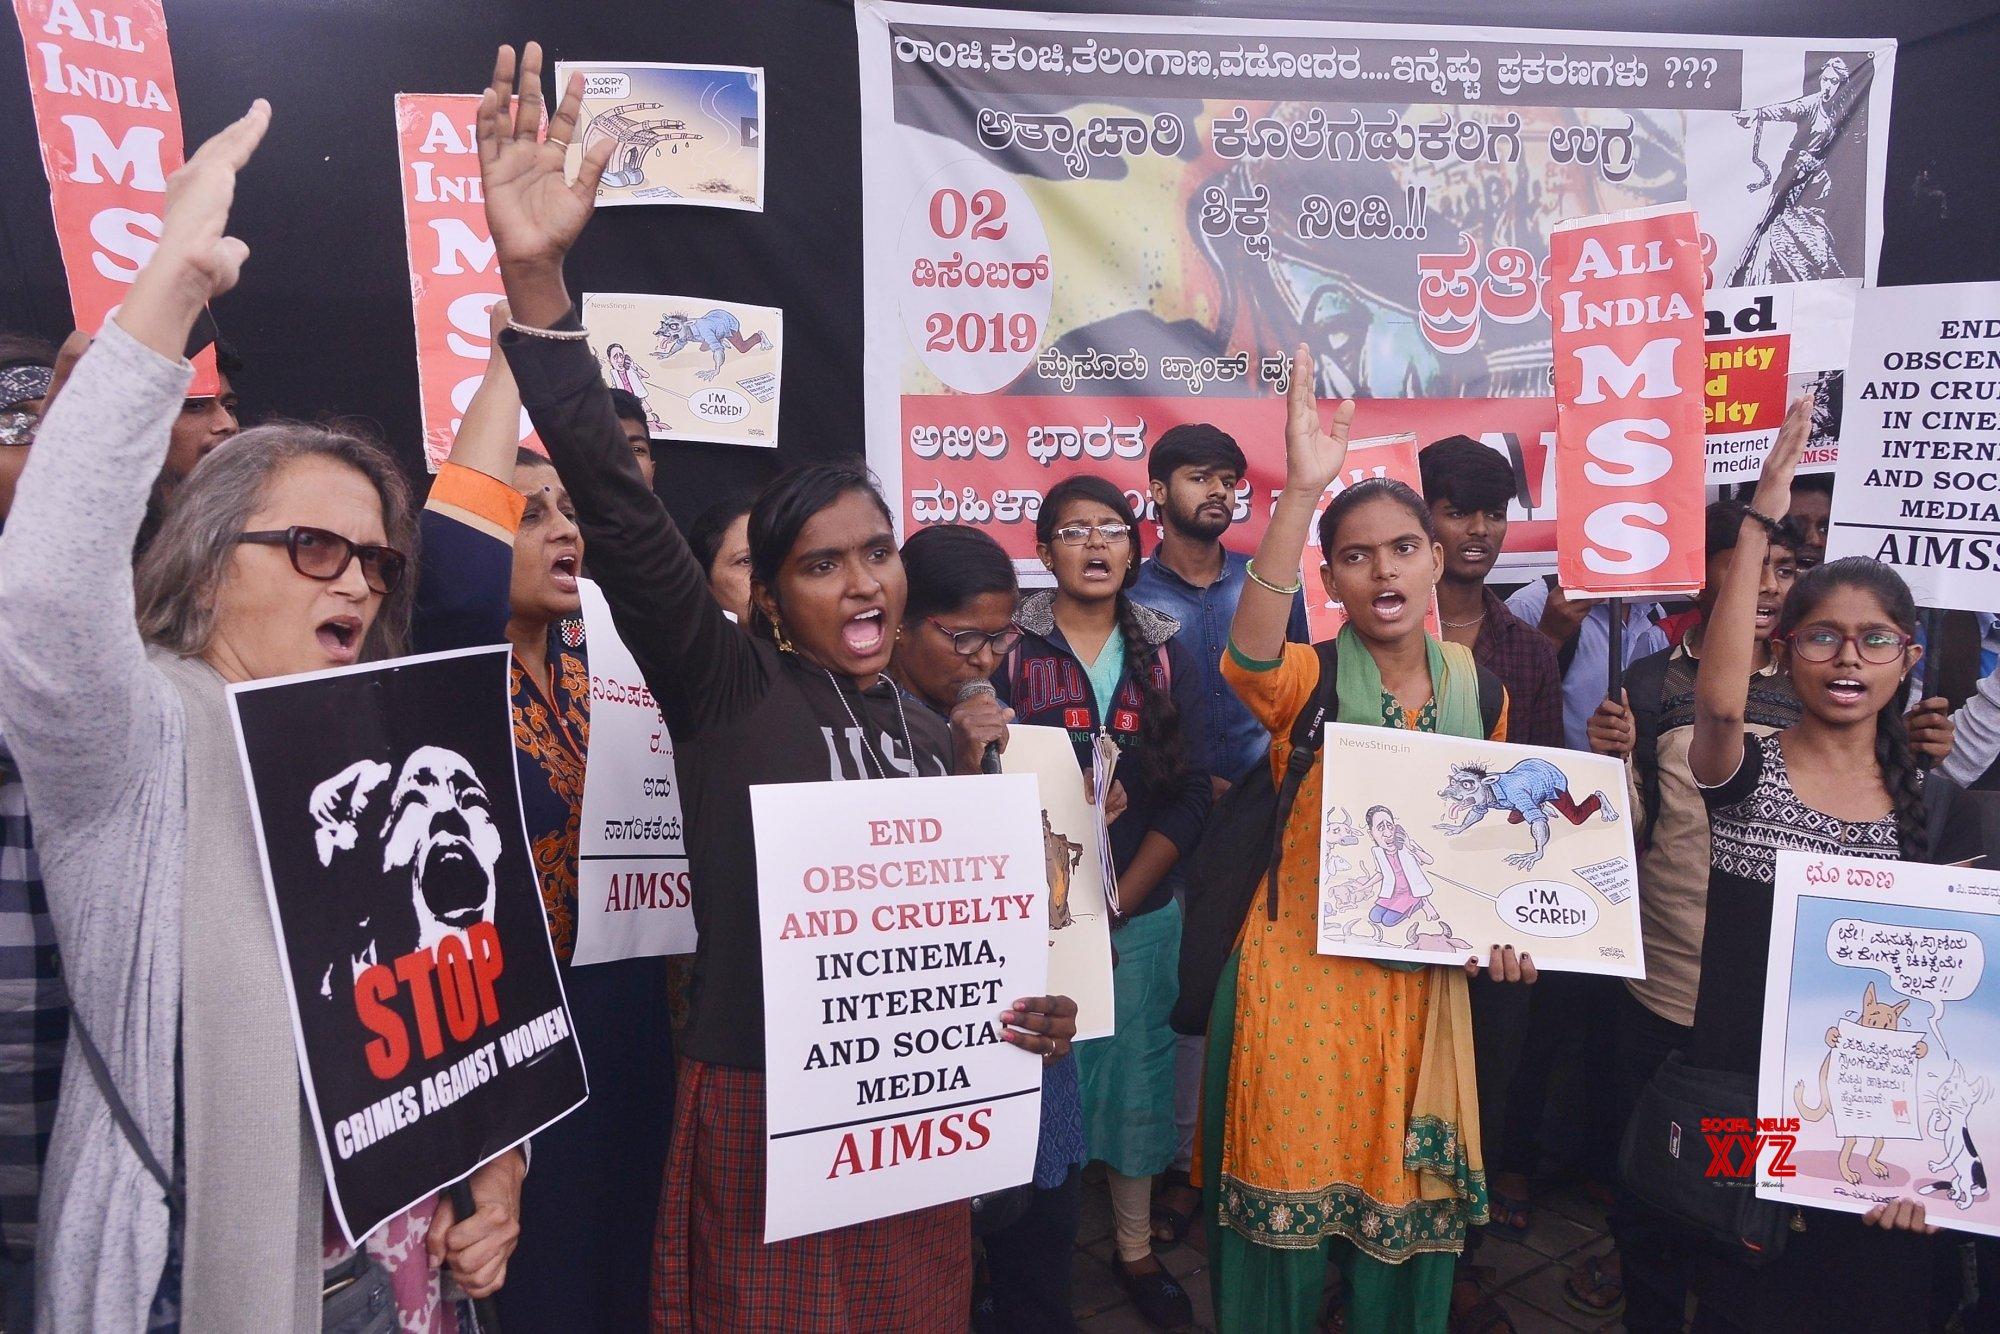 Bengaluru: AIMSS members protest #Gallery